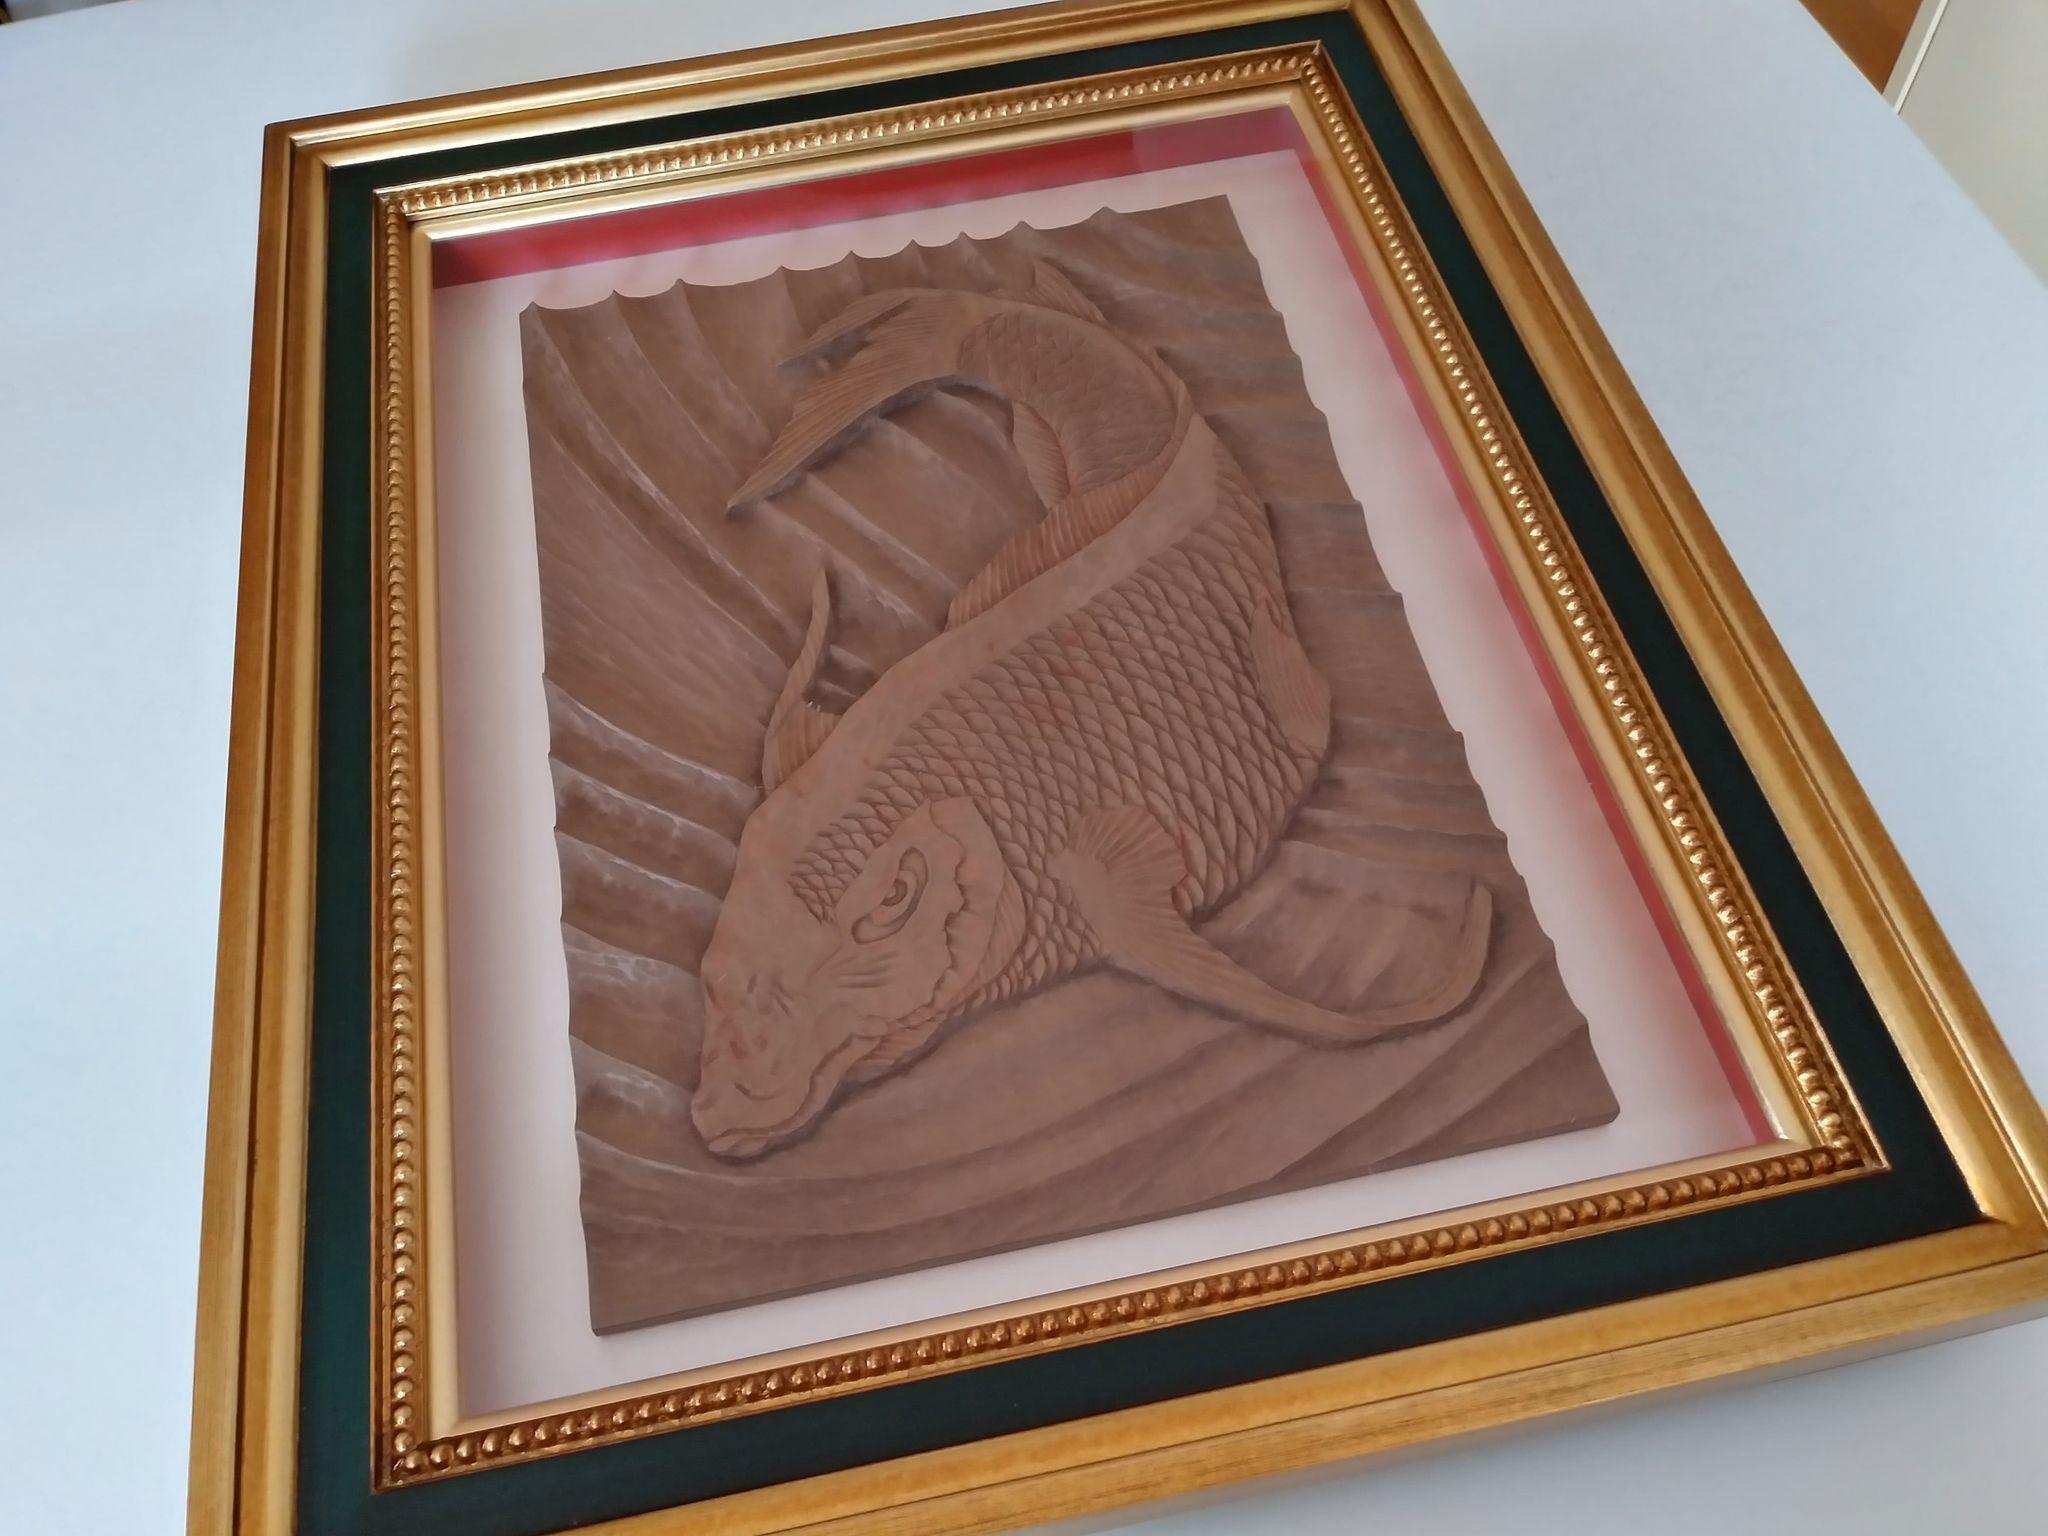 【制作実績】木彫作品『鯉から龍』完成5